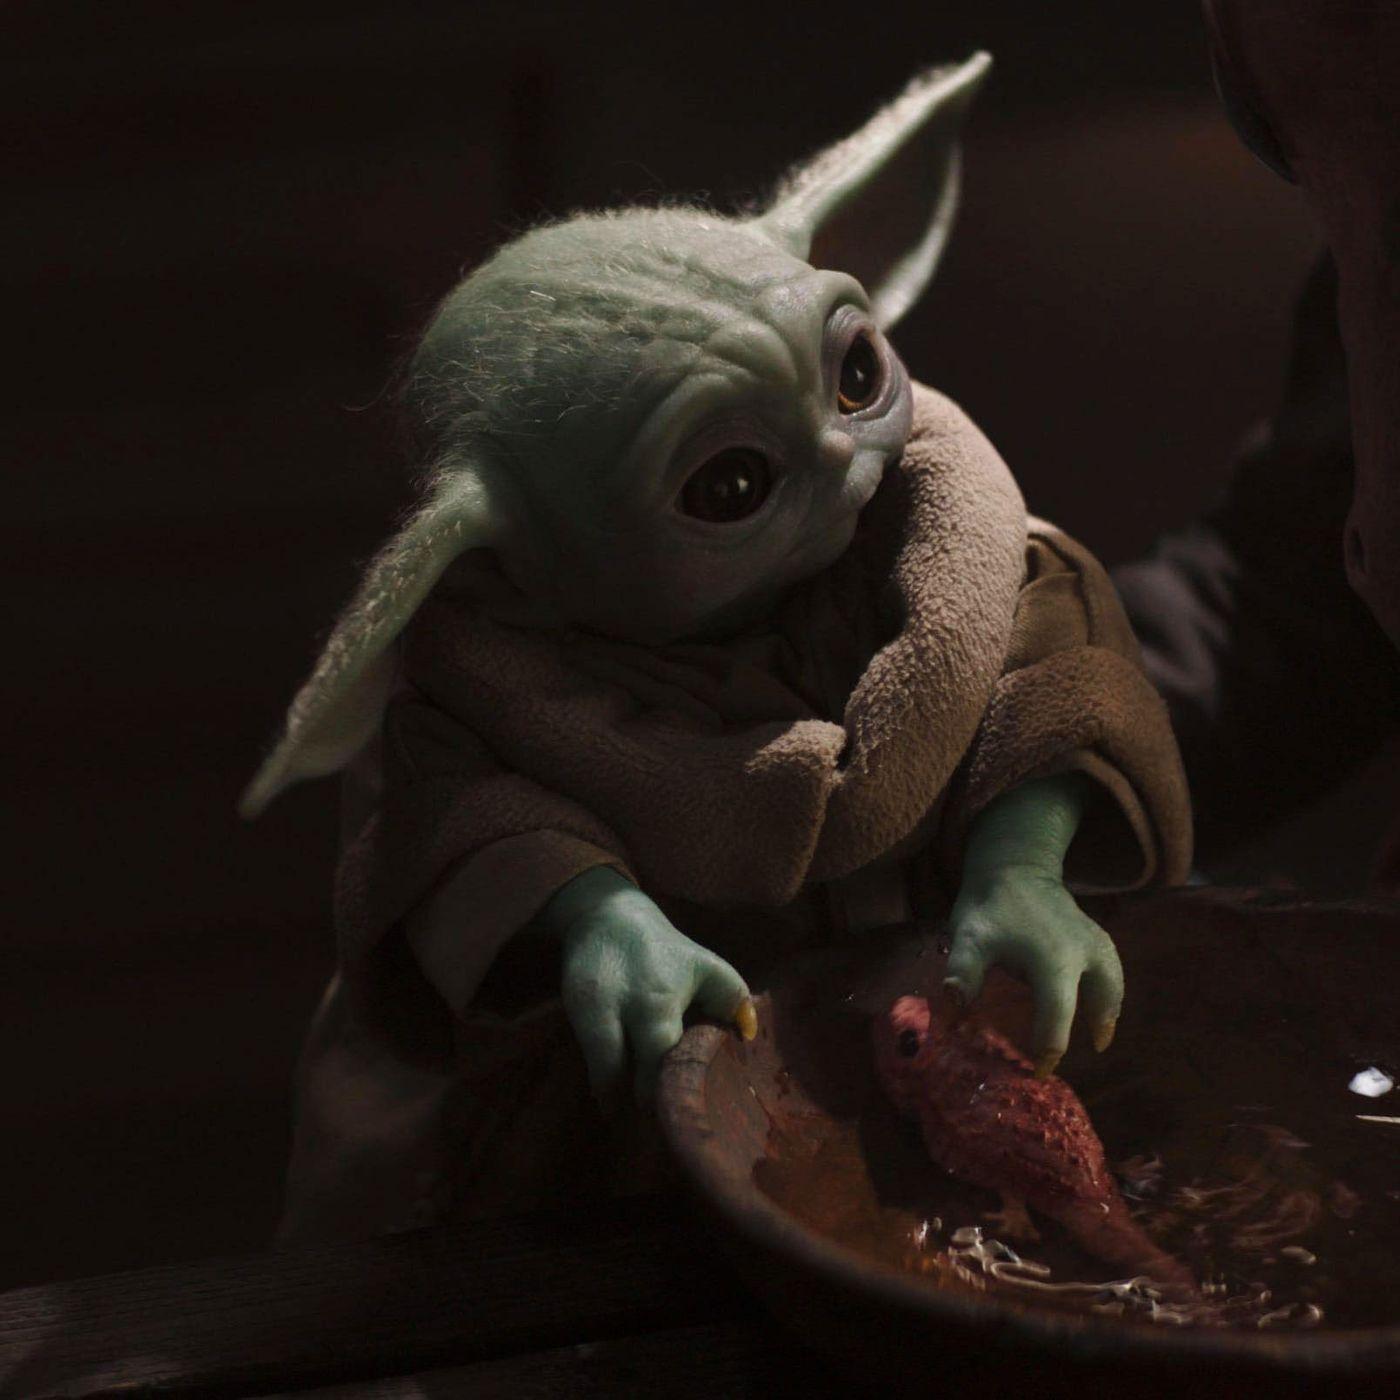 The Mandalorian Let Baby Yoda Be A Baby And It Was Good Mandalorian Star Wars Memes Yoda